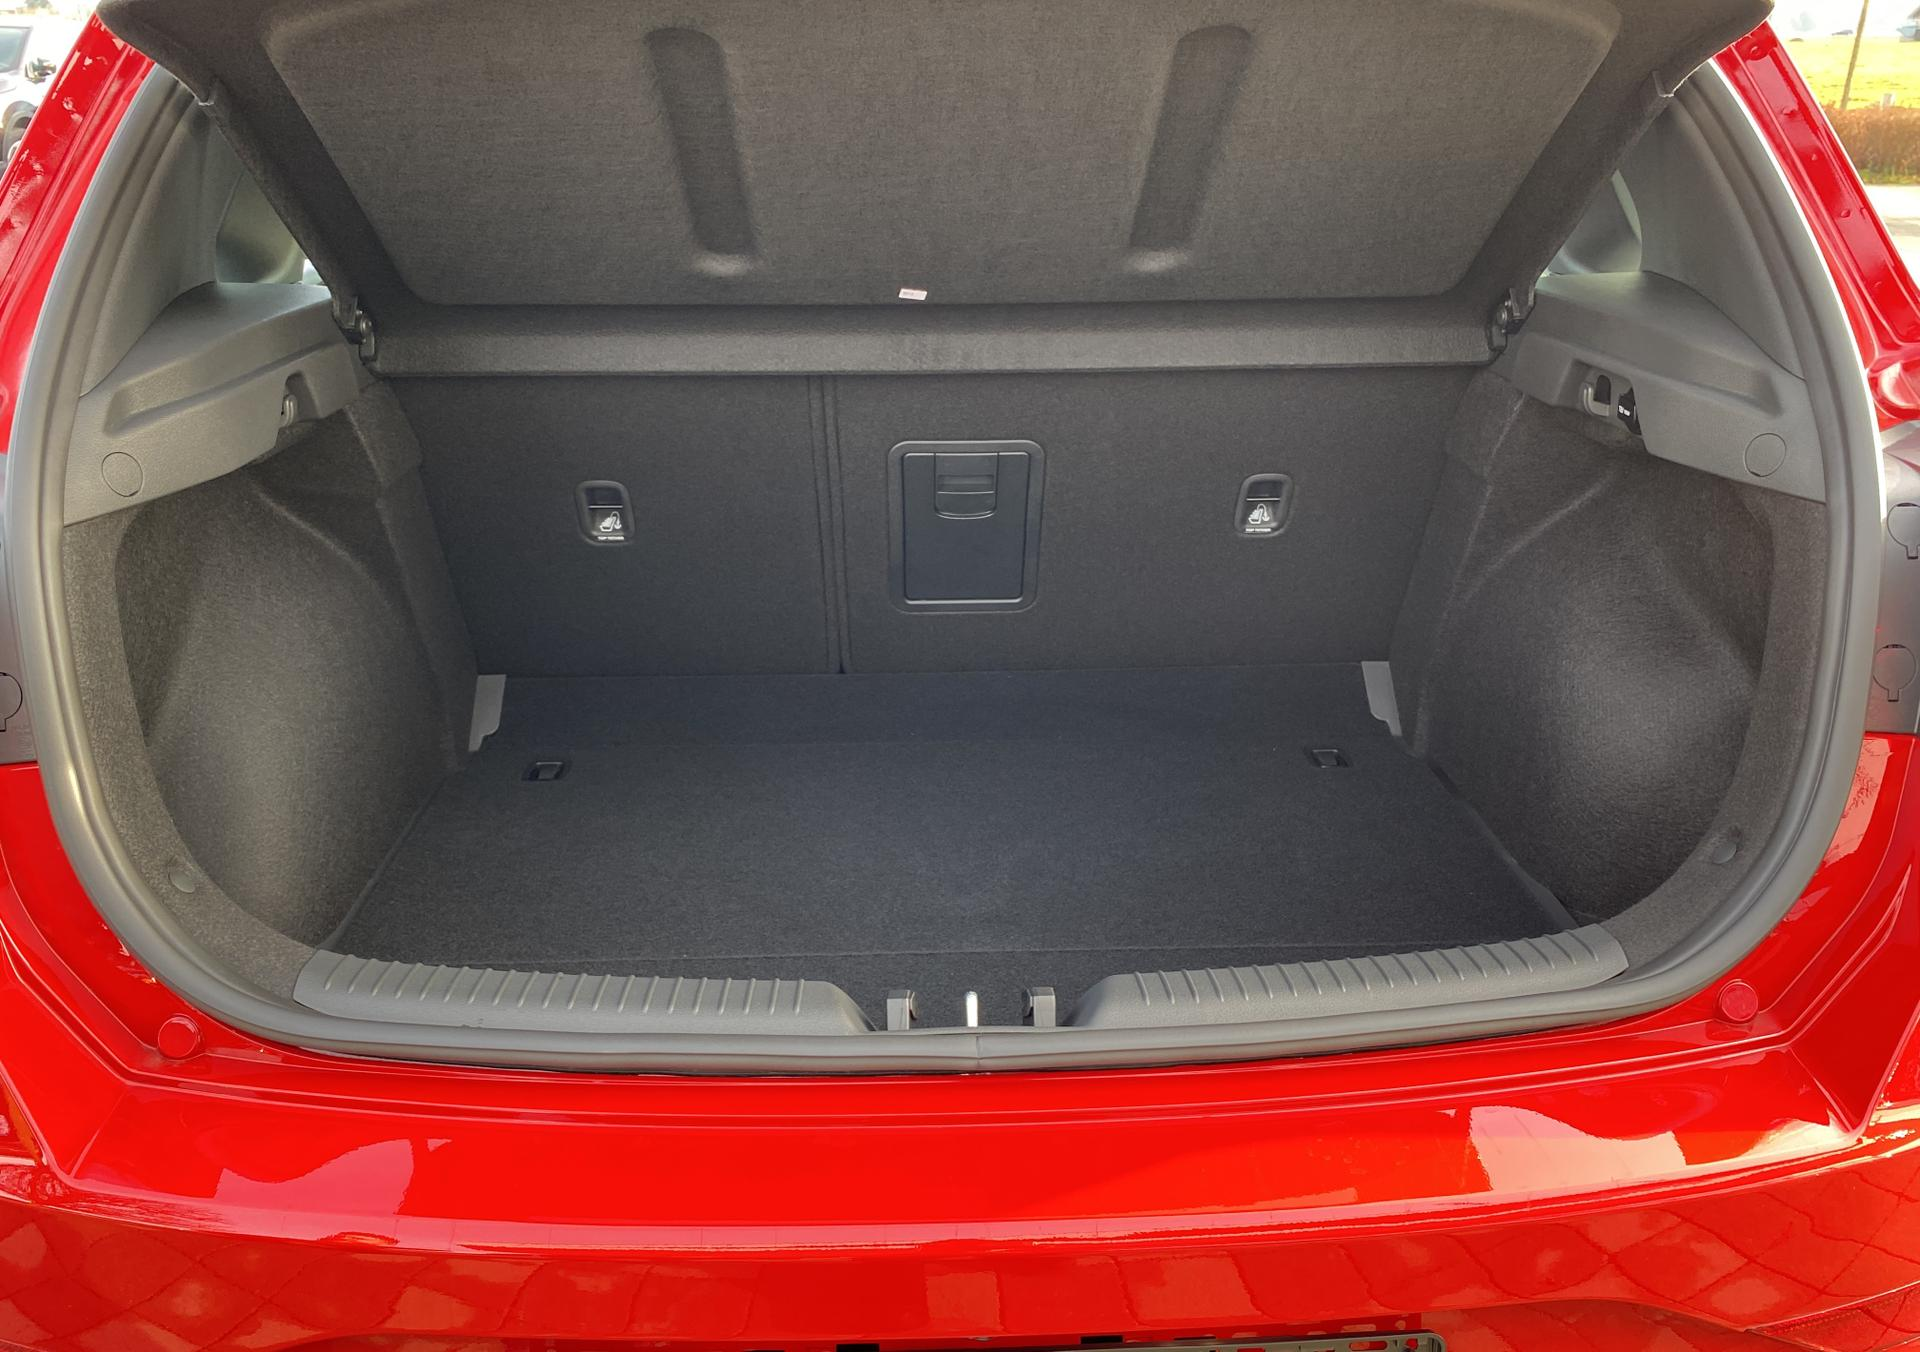 Hyundai i30 1.5 T-GDI iMT N Line Kofferraum